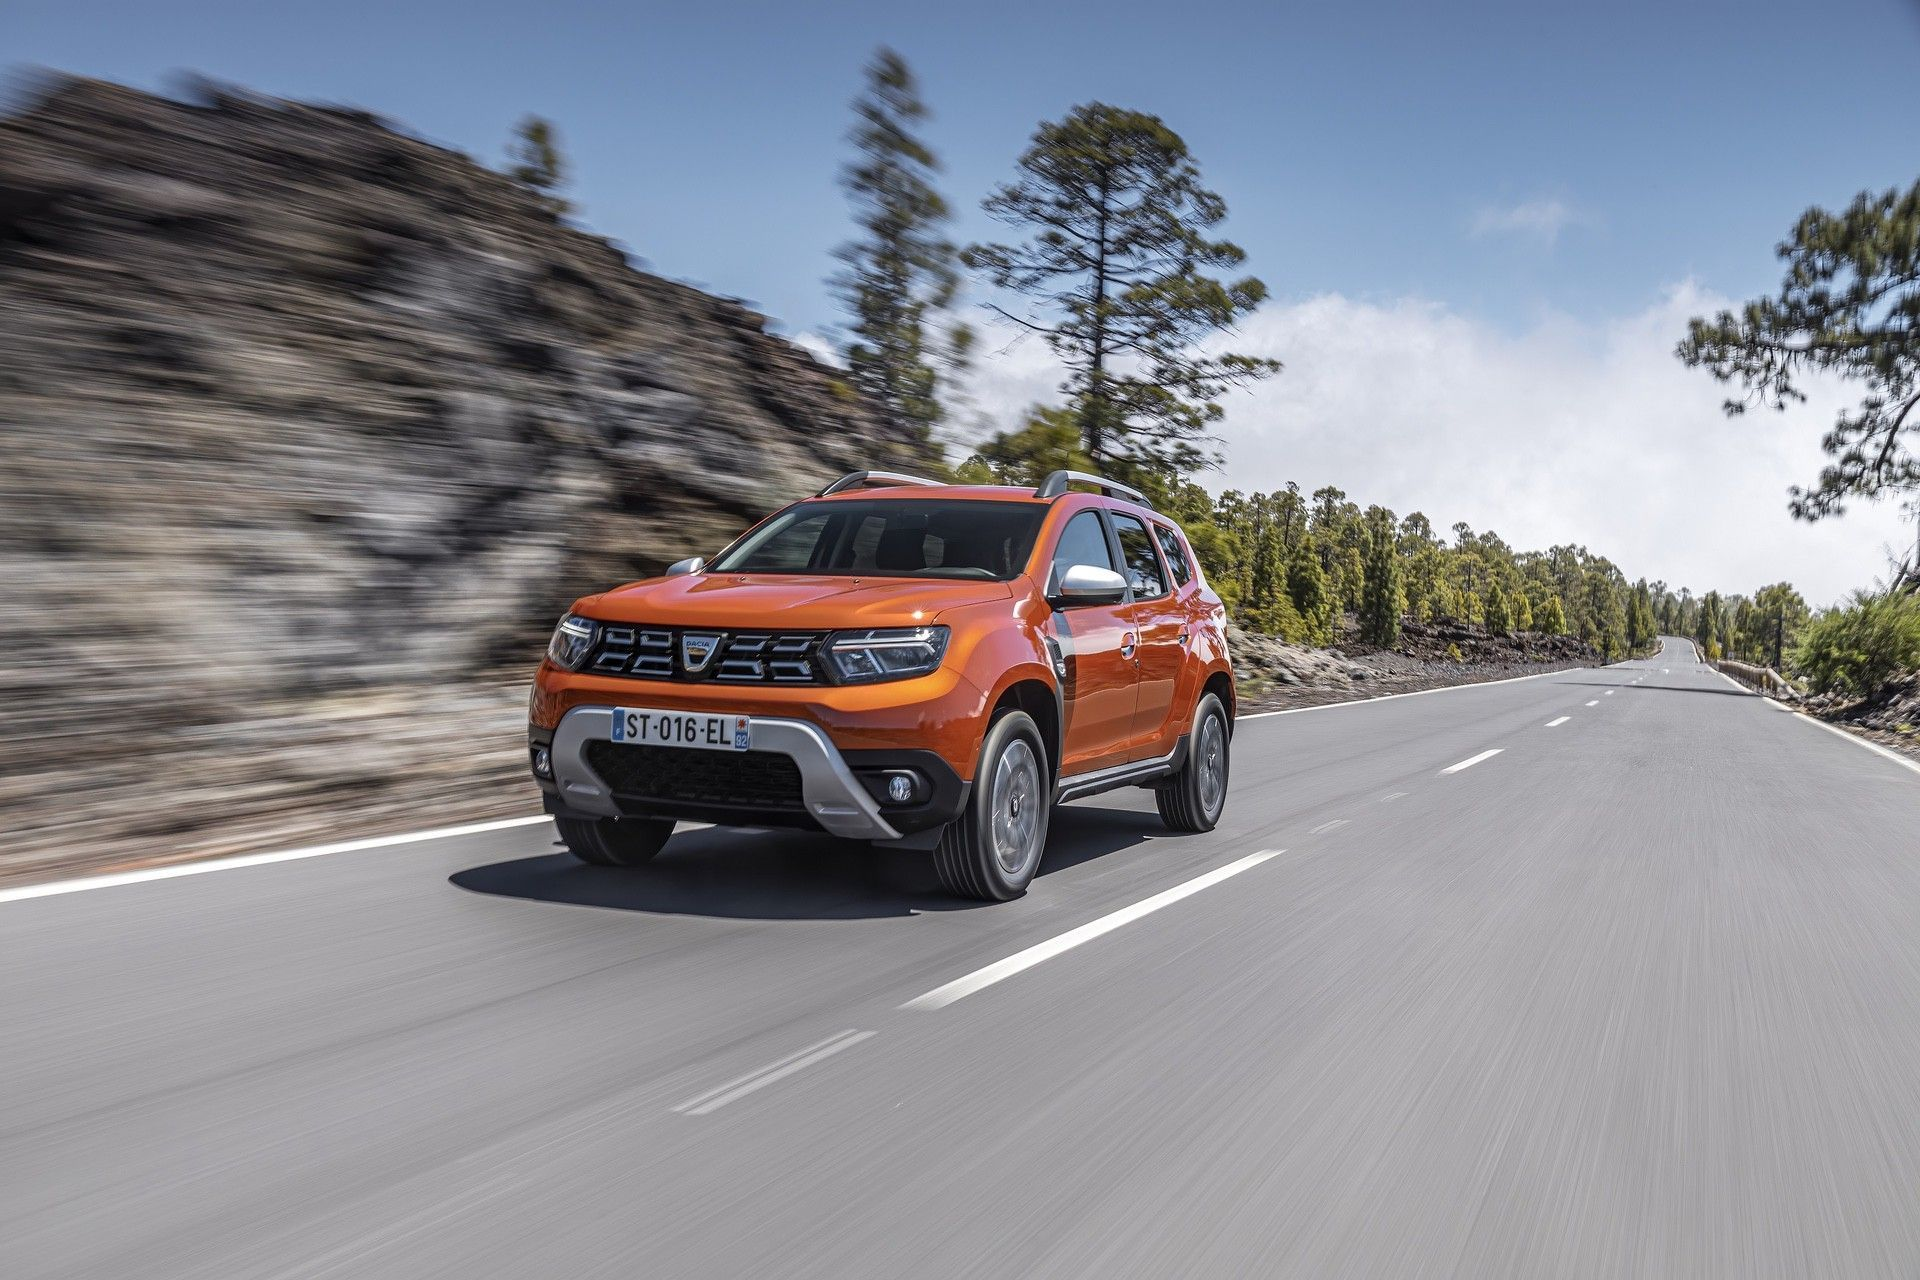 2021_Dacia_Duster_facelift-0010